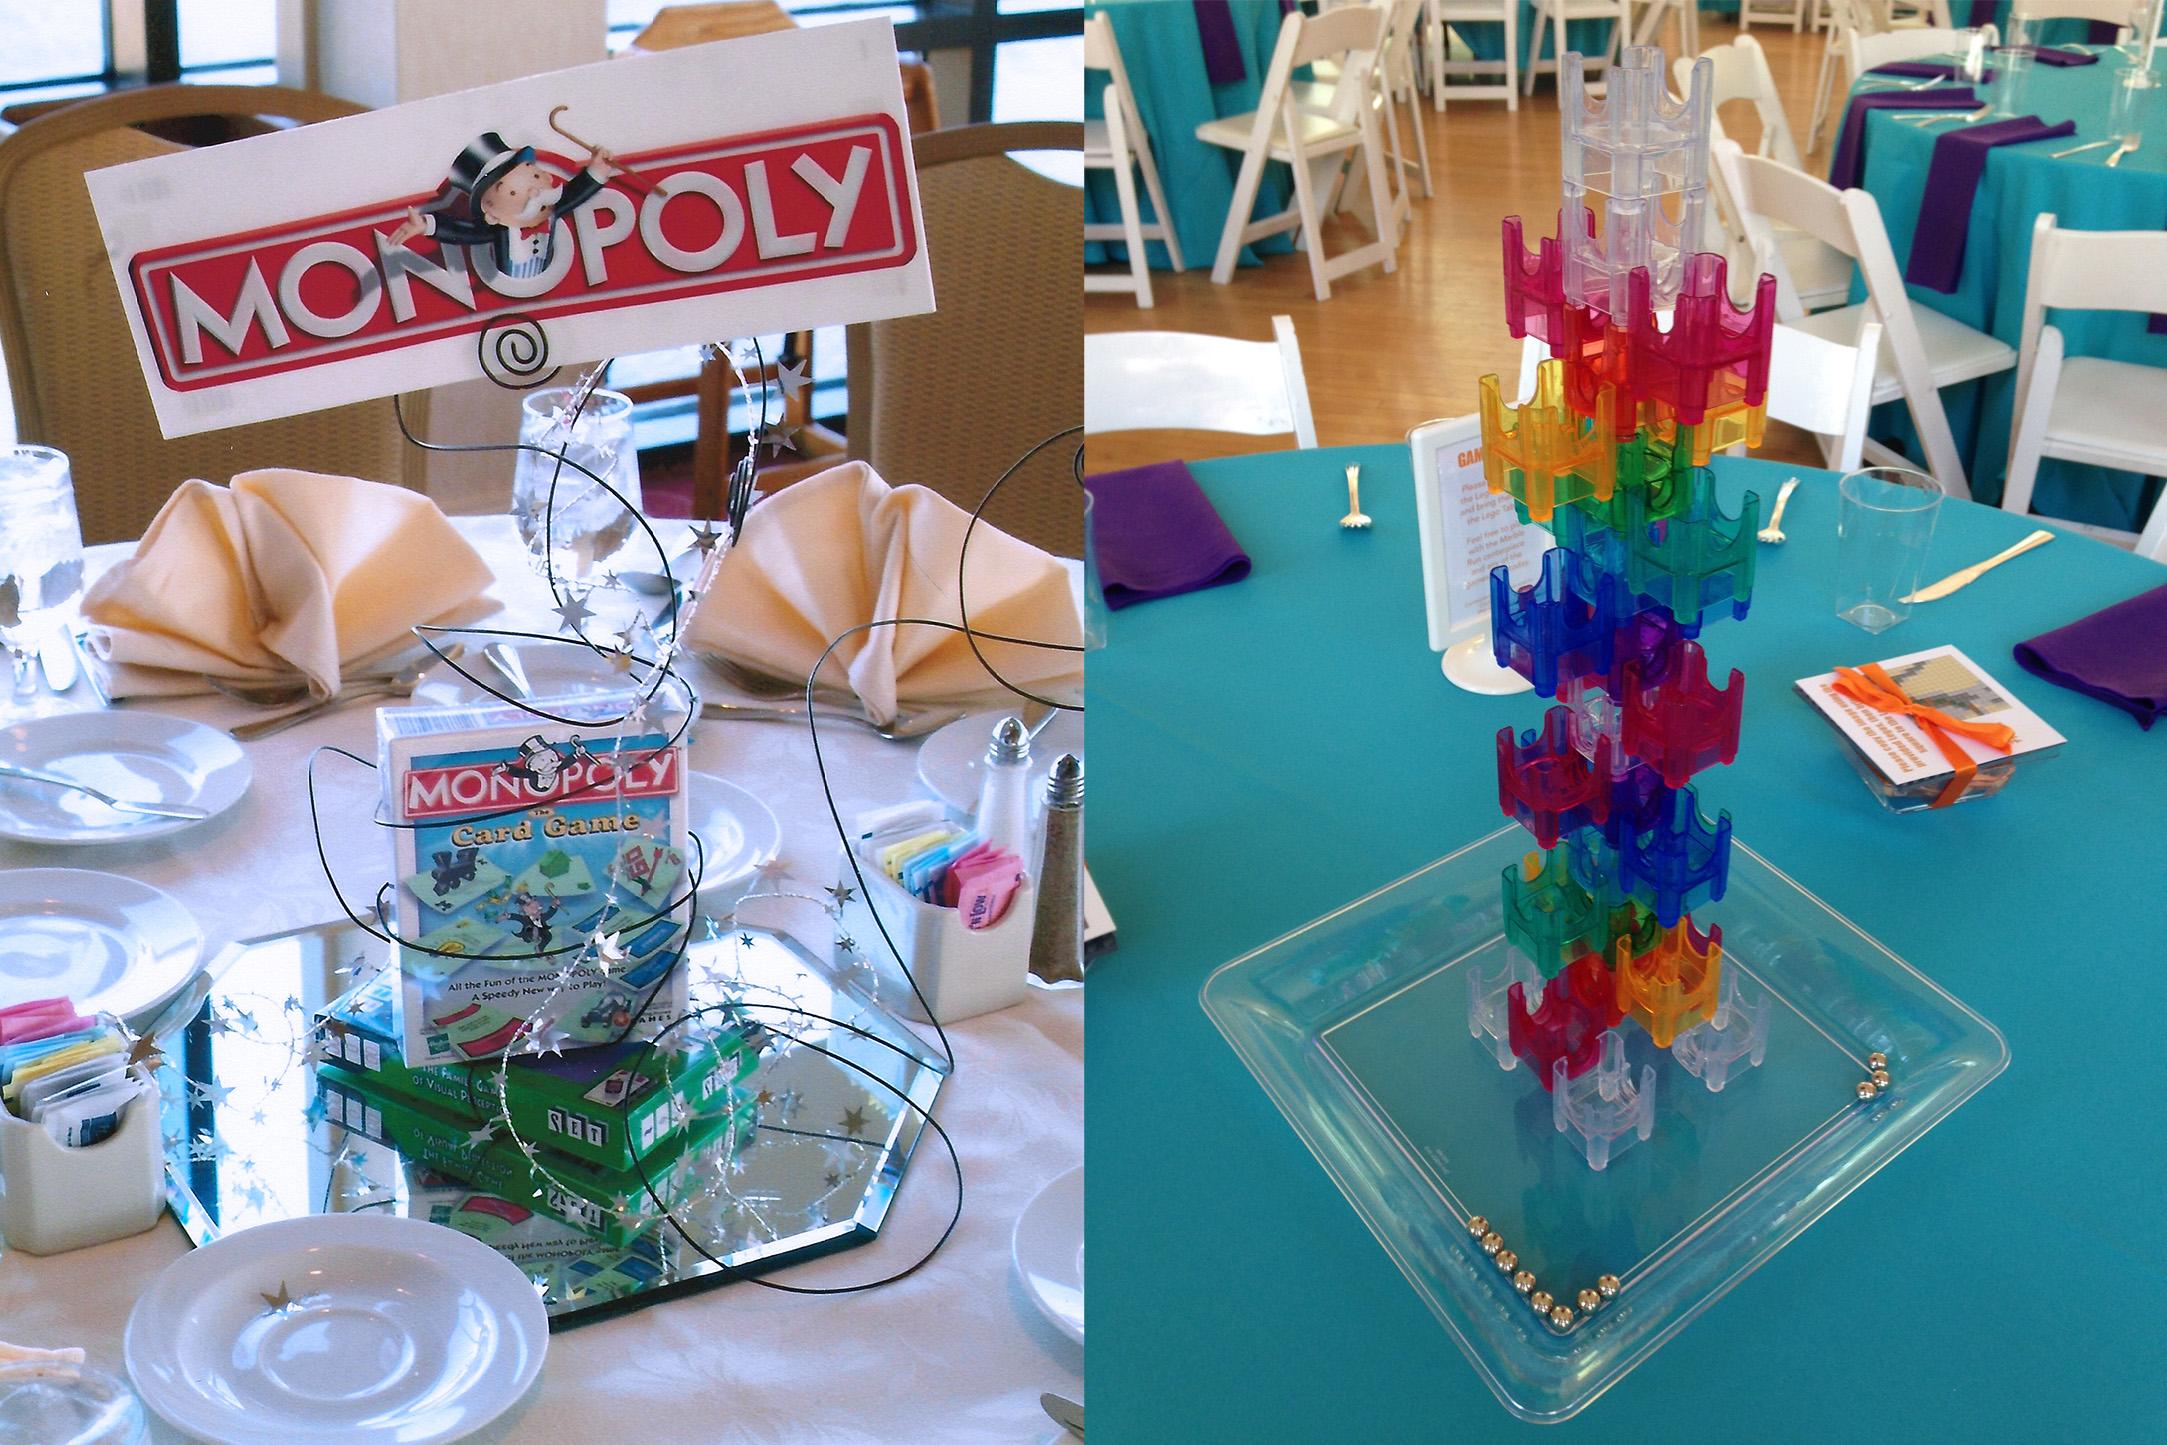 monopoly table set-up copy